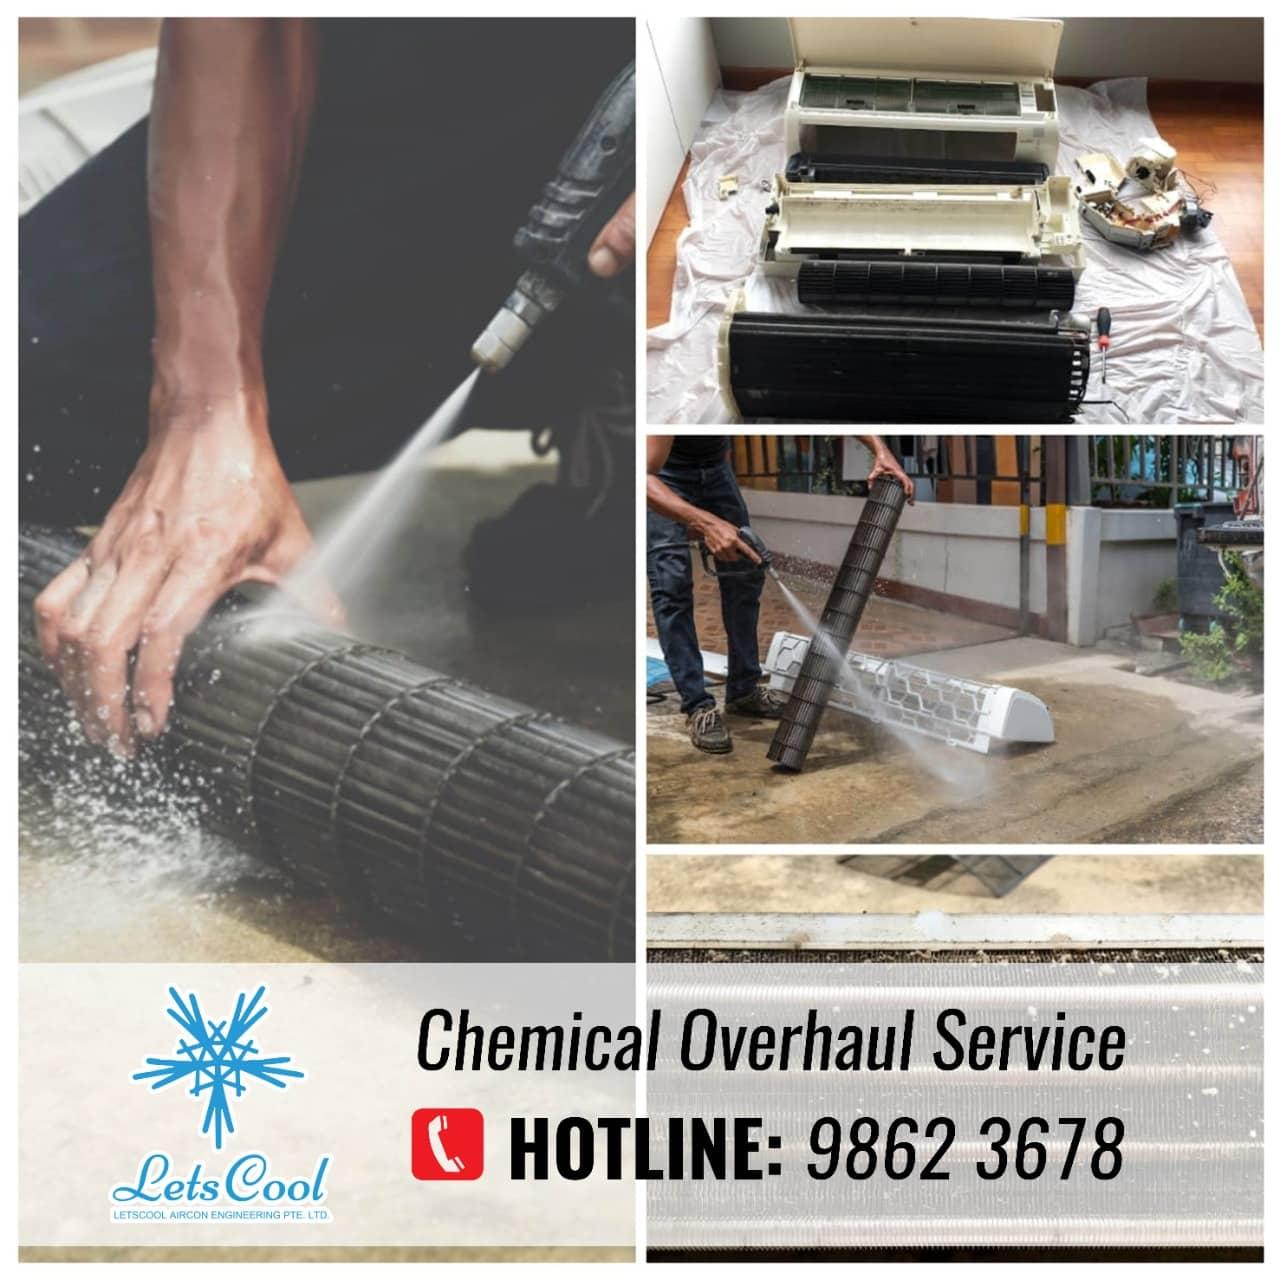 chemical overhaul service